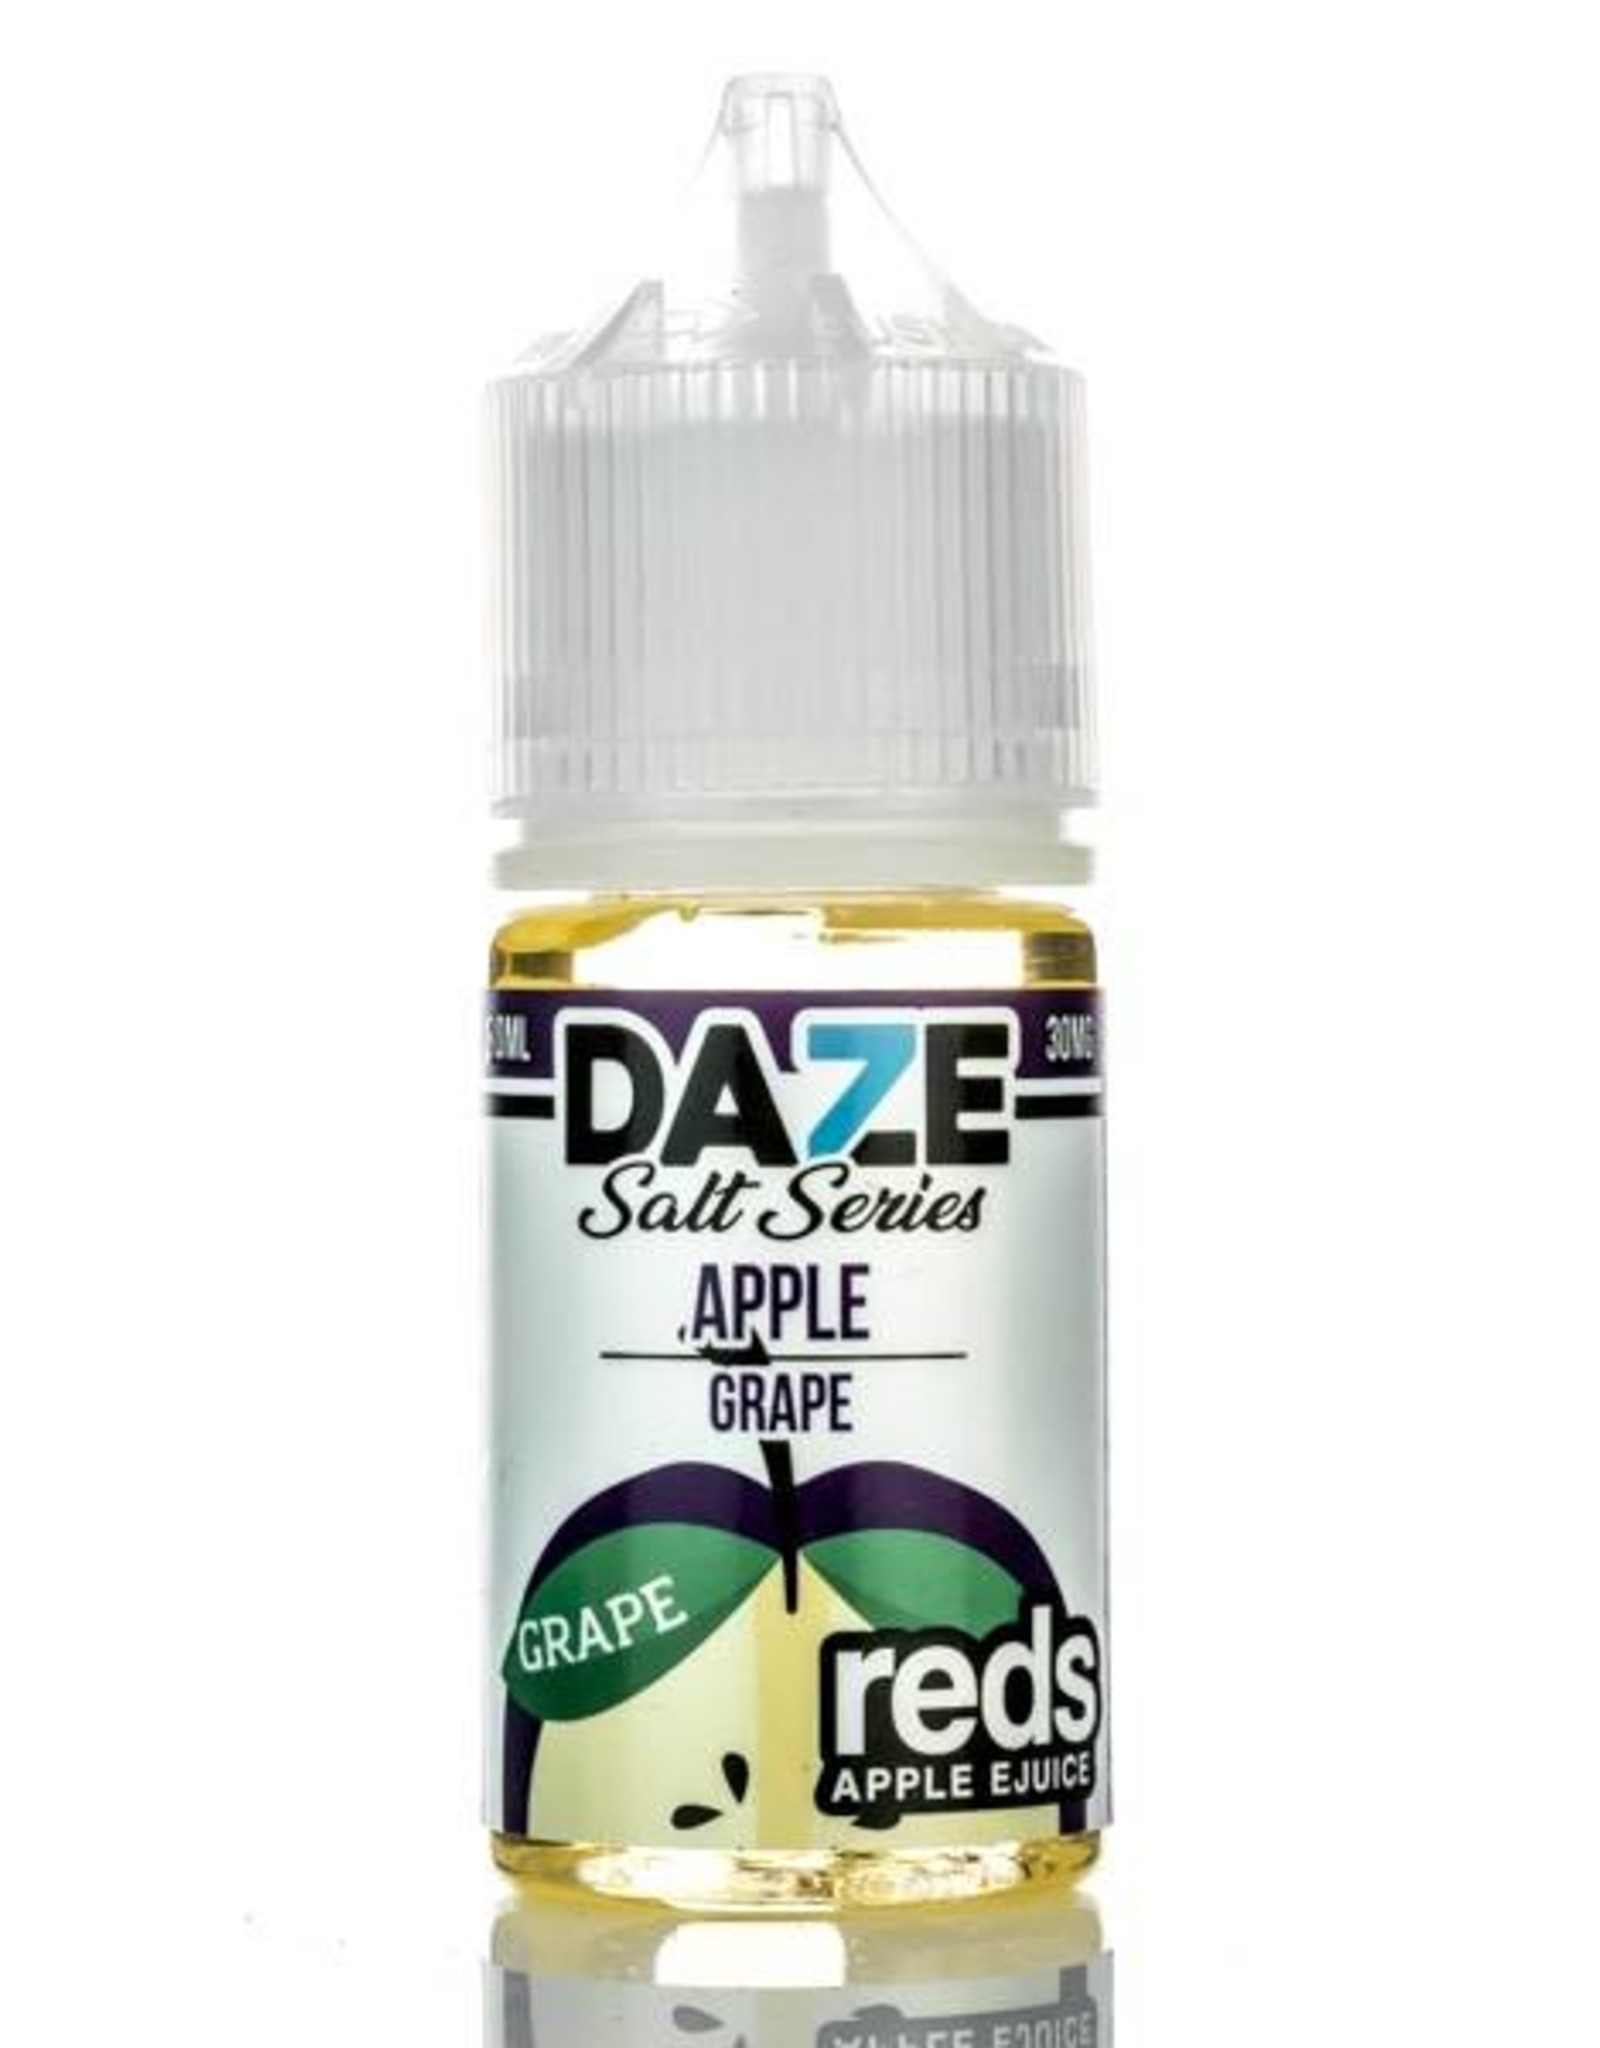 7 Daze - Salt Series Apple *Grape* (30mL)